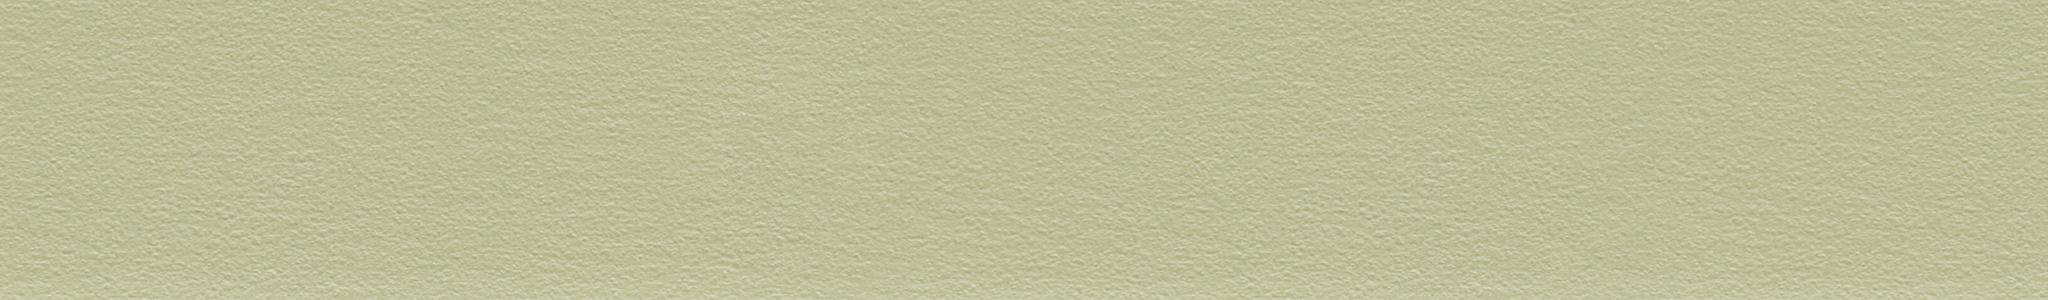 HU 164439 ABS Edge Green Soft Pearl 107